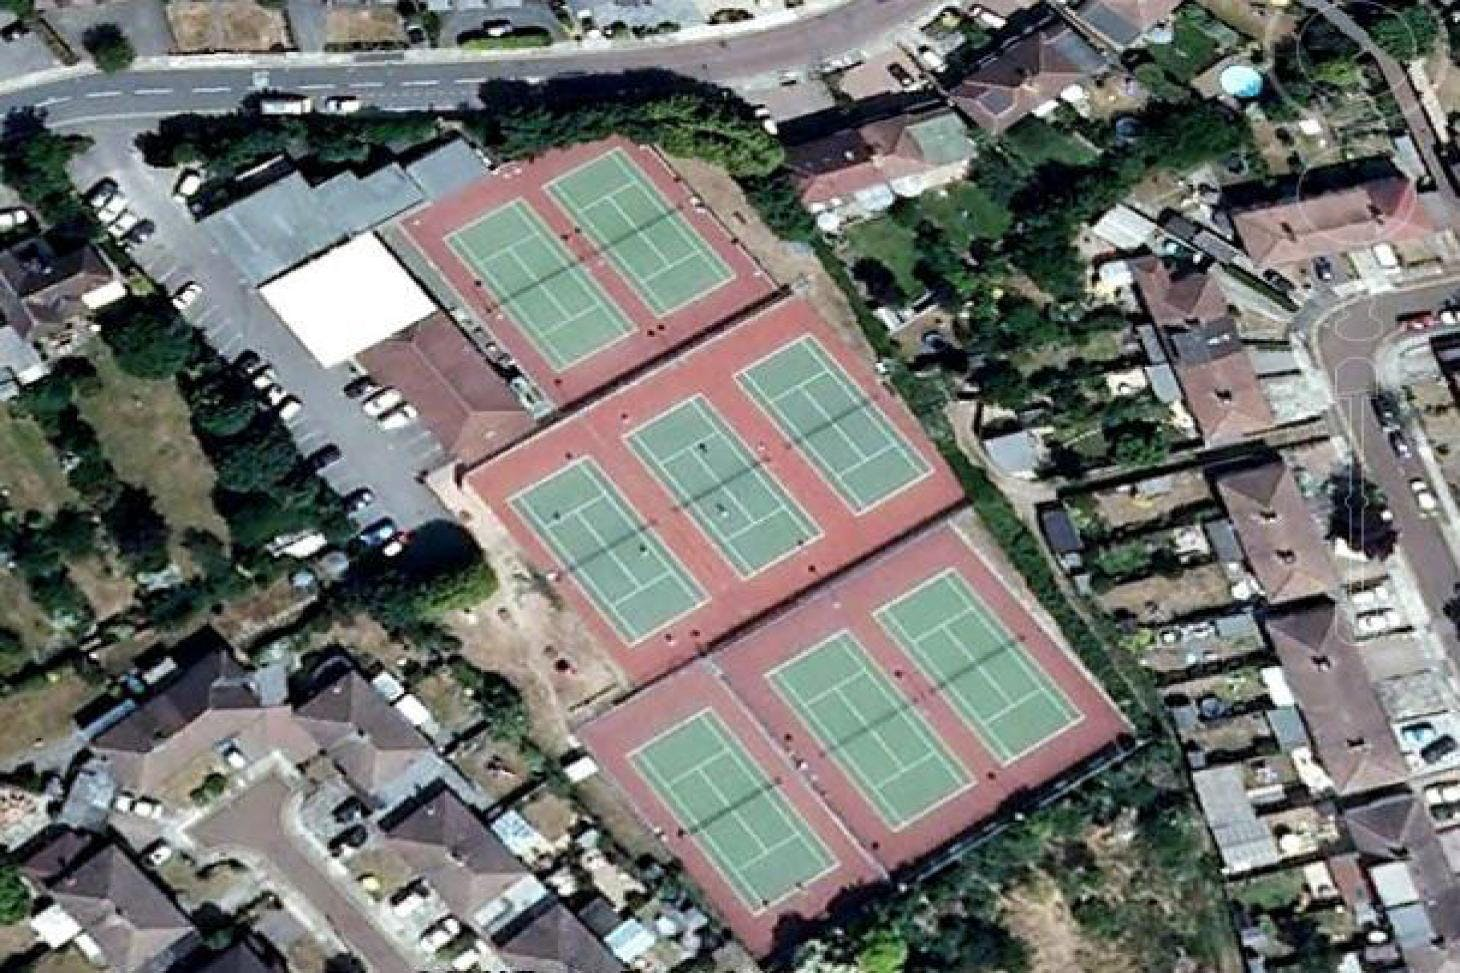 The Bexley Lawn Tennis, Squash & Racketball Club Outdoor | Hard (macadam) tennis court